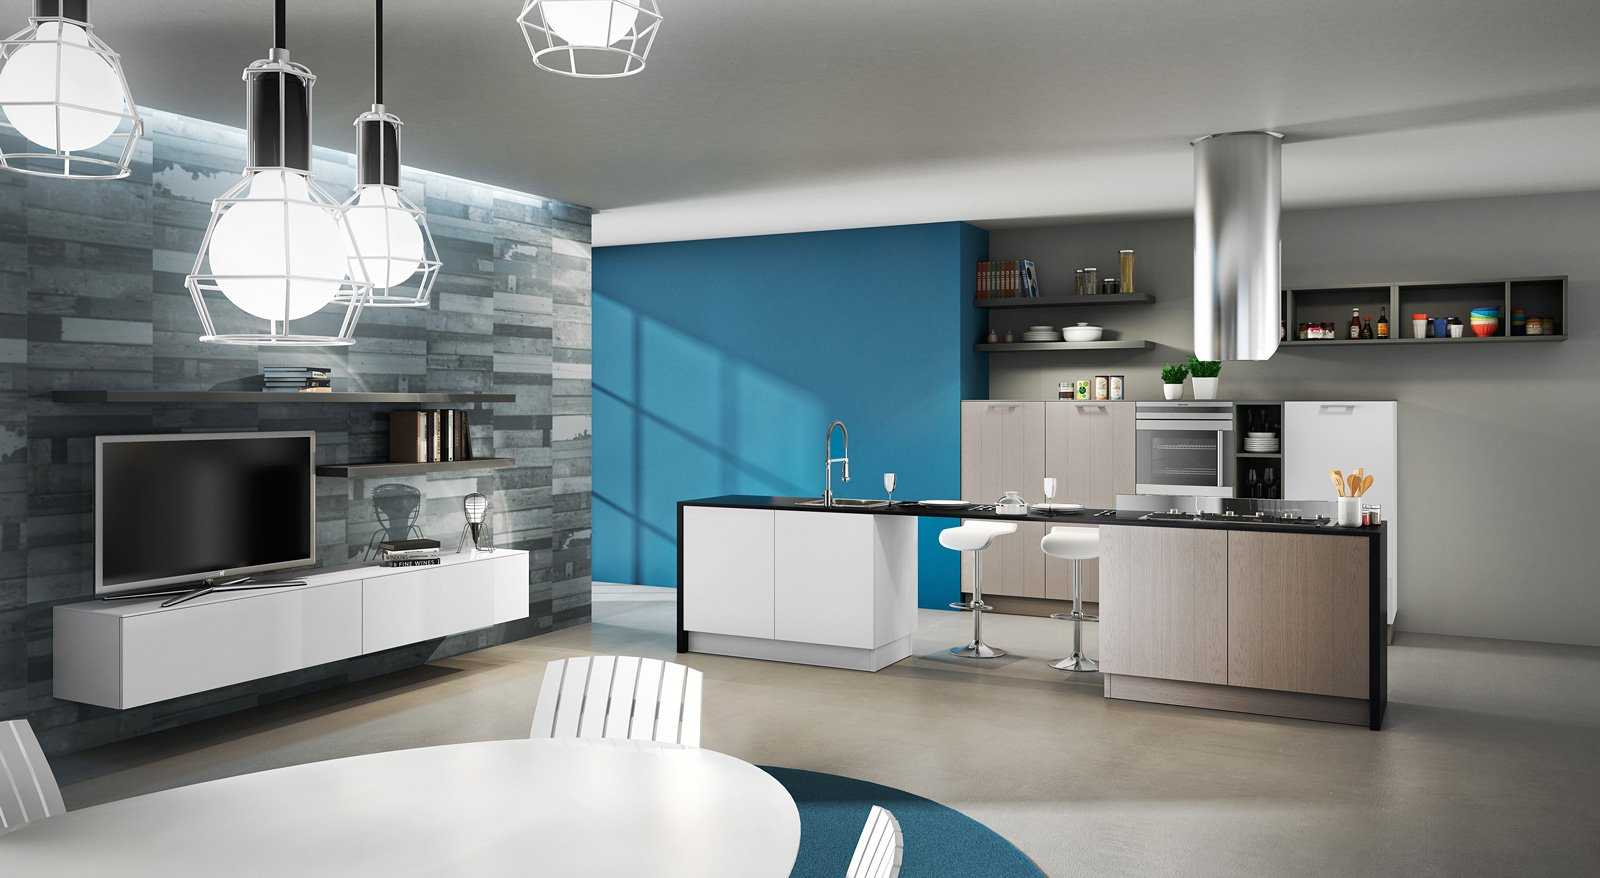 Arredamento cucine piccole cose di casa - Arredamento cucine moderne ...